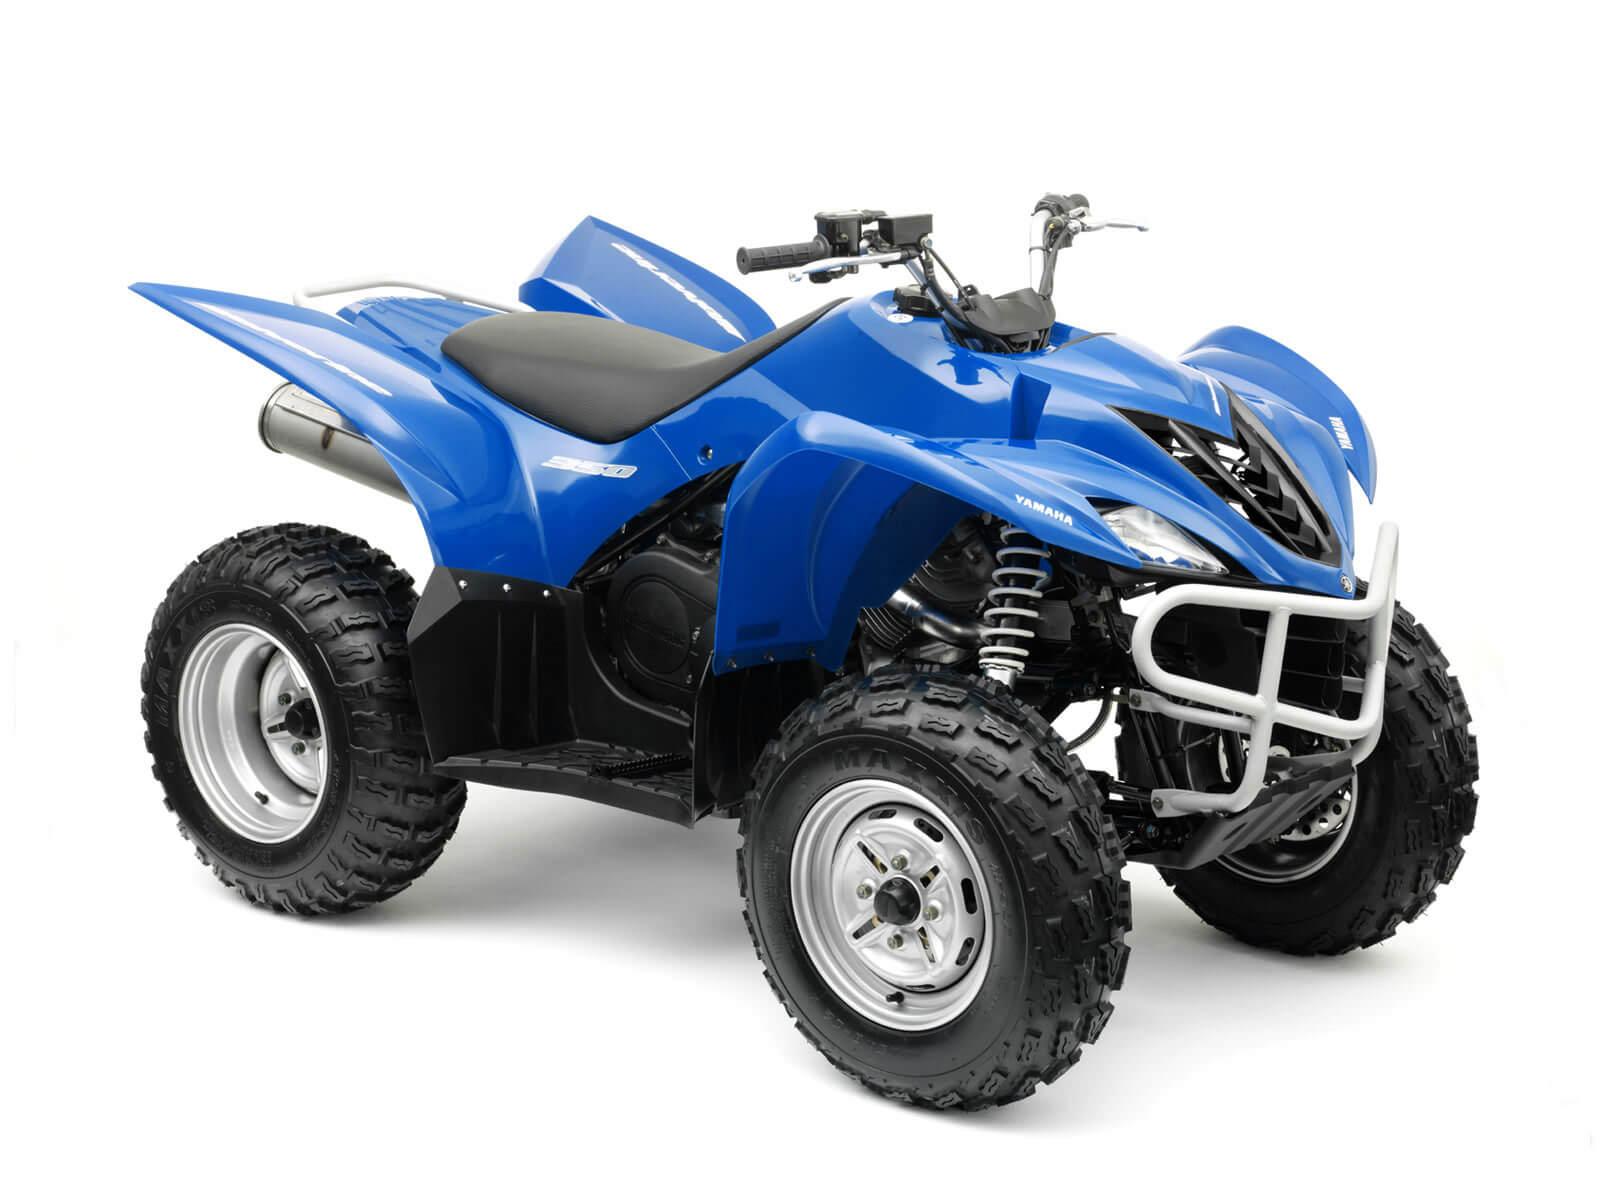 Yamaha Wolverine 350